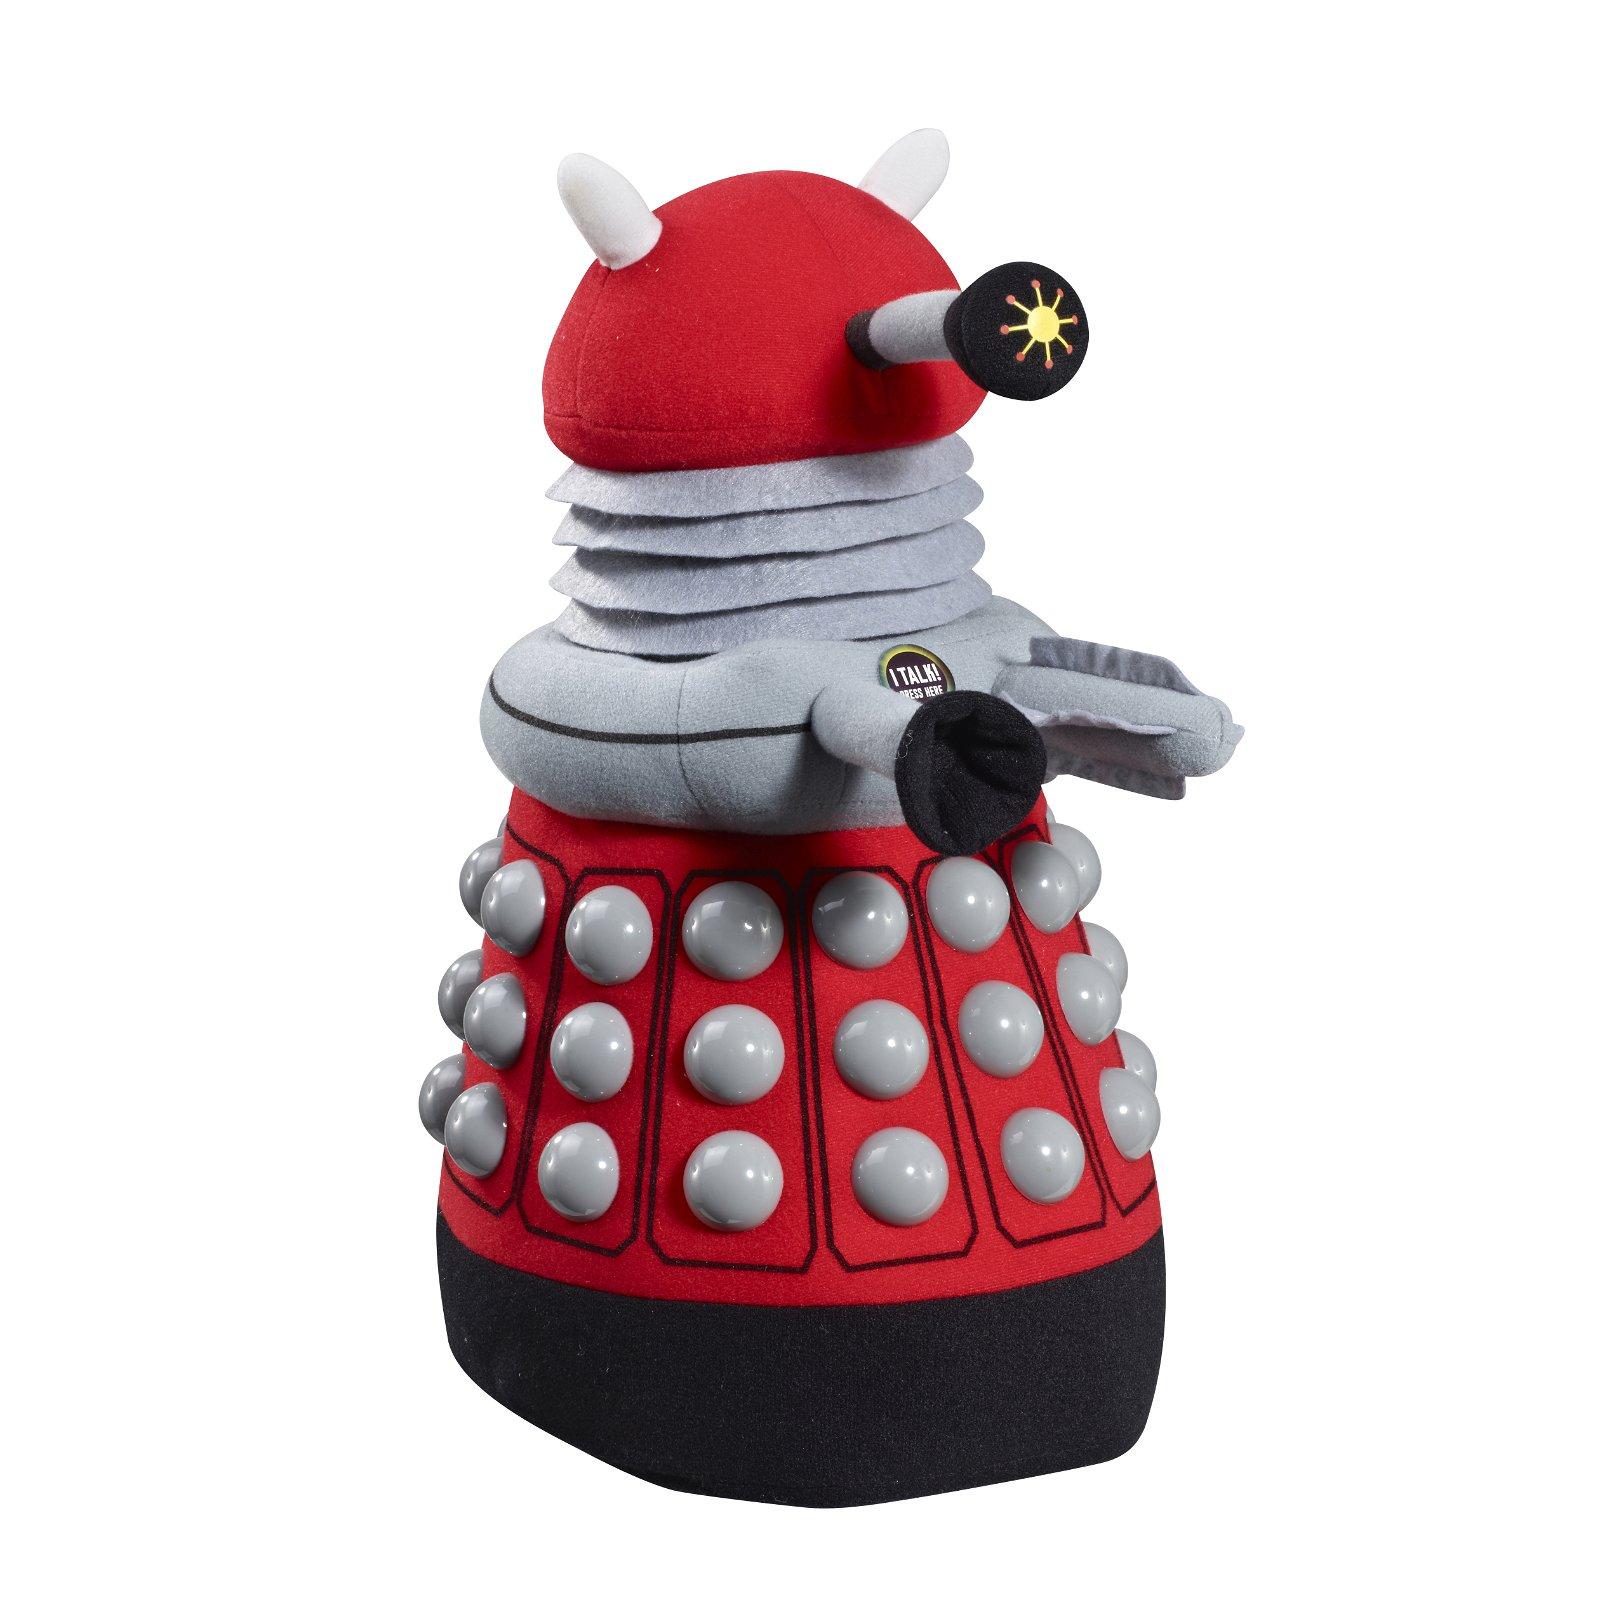 Dalek Talking Plush